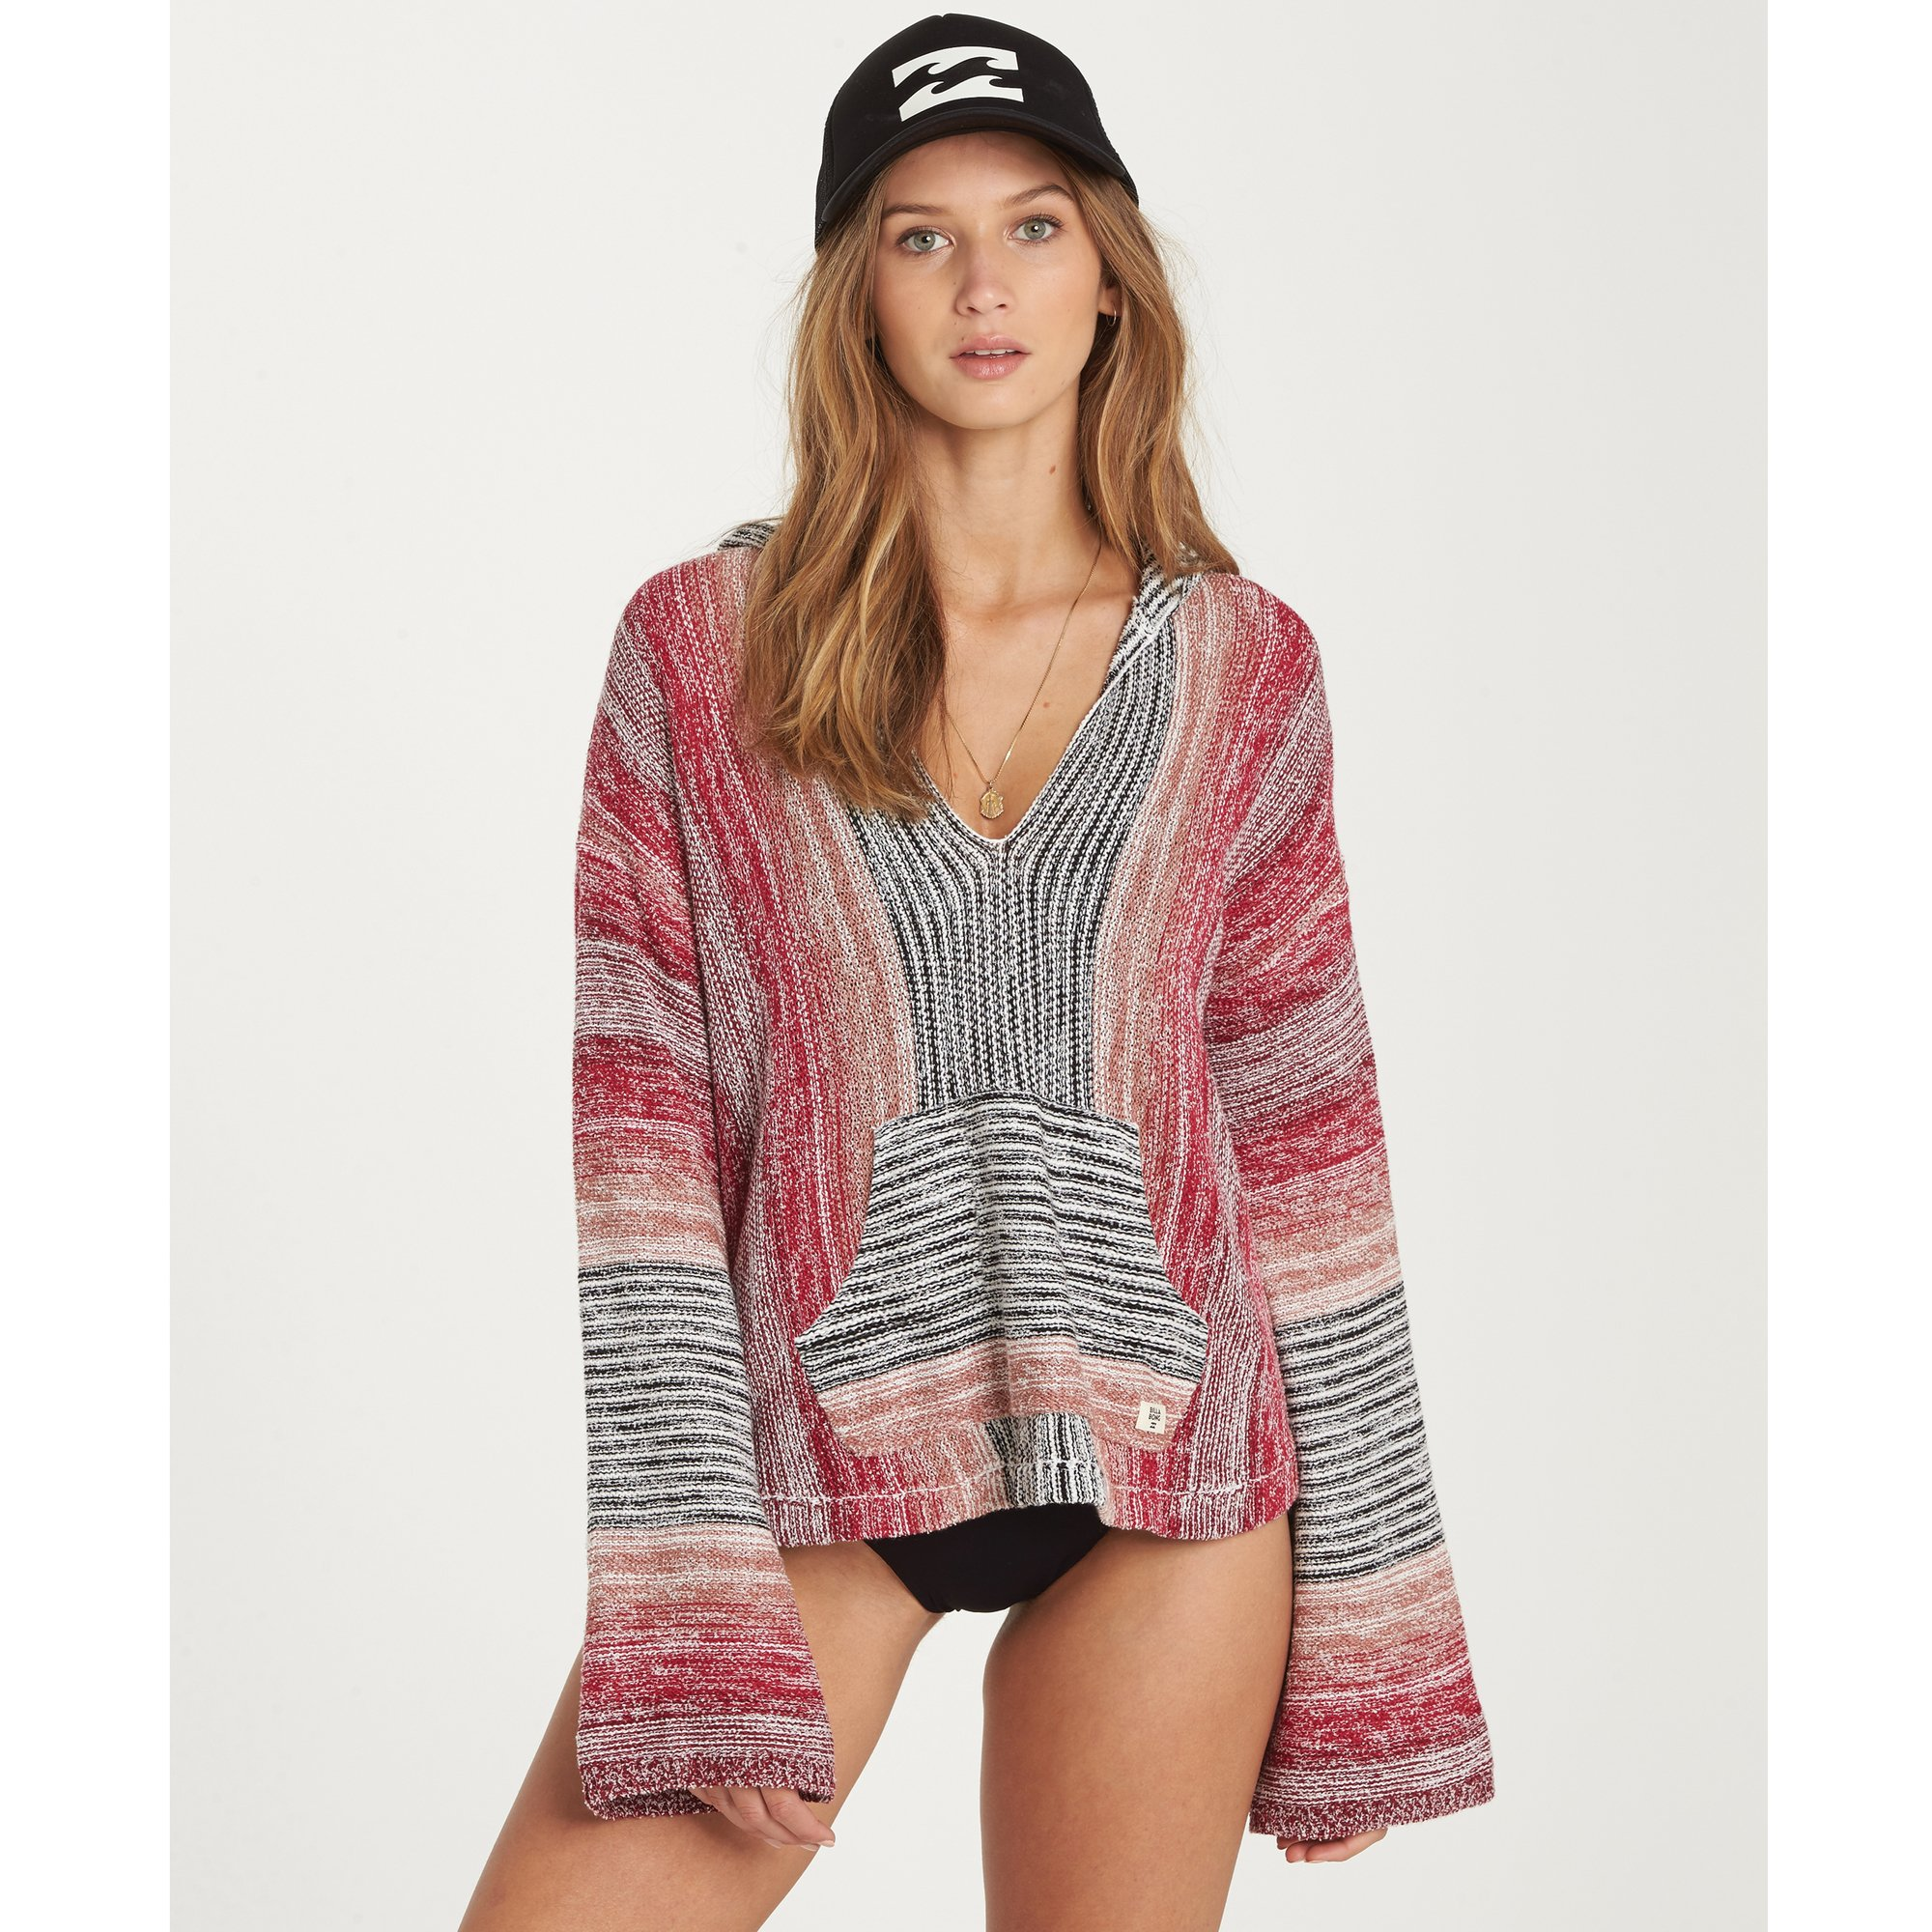 Billabong Women's Baja Beach Sweater, White Cap, L